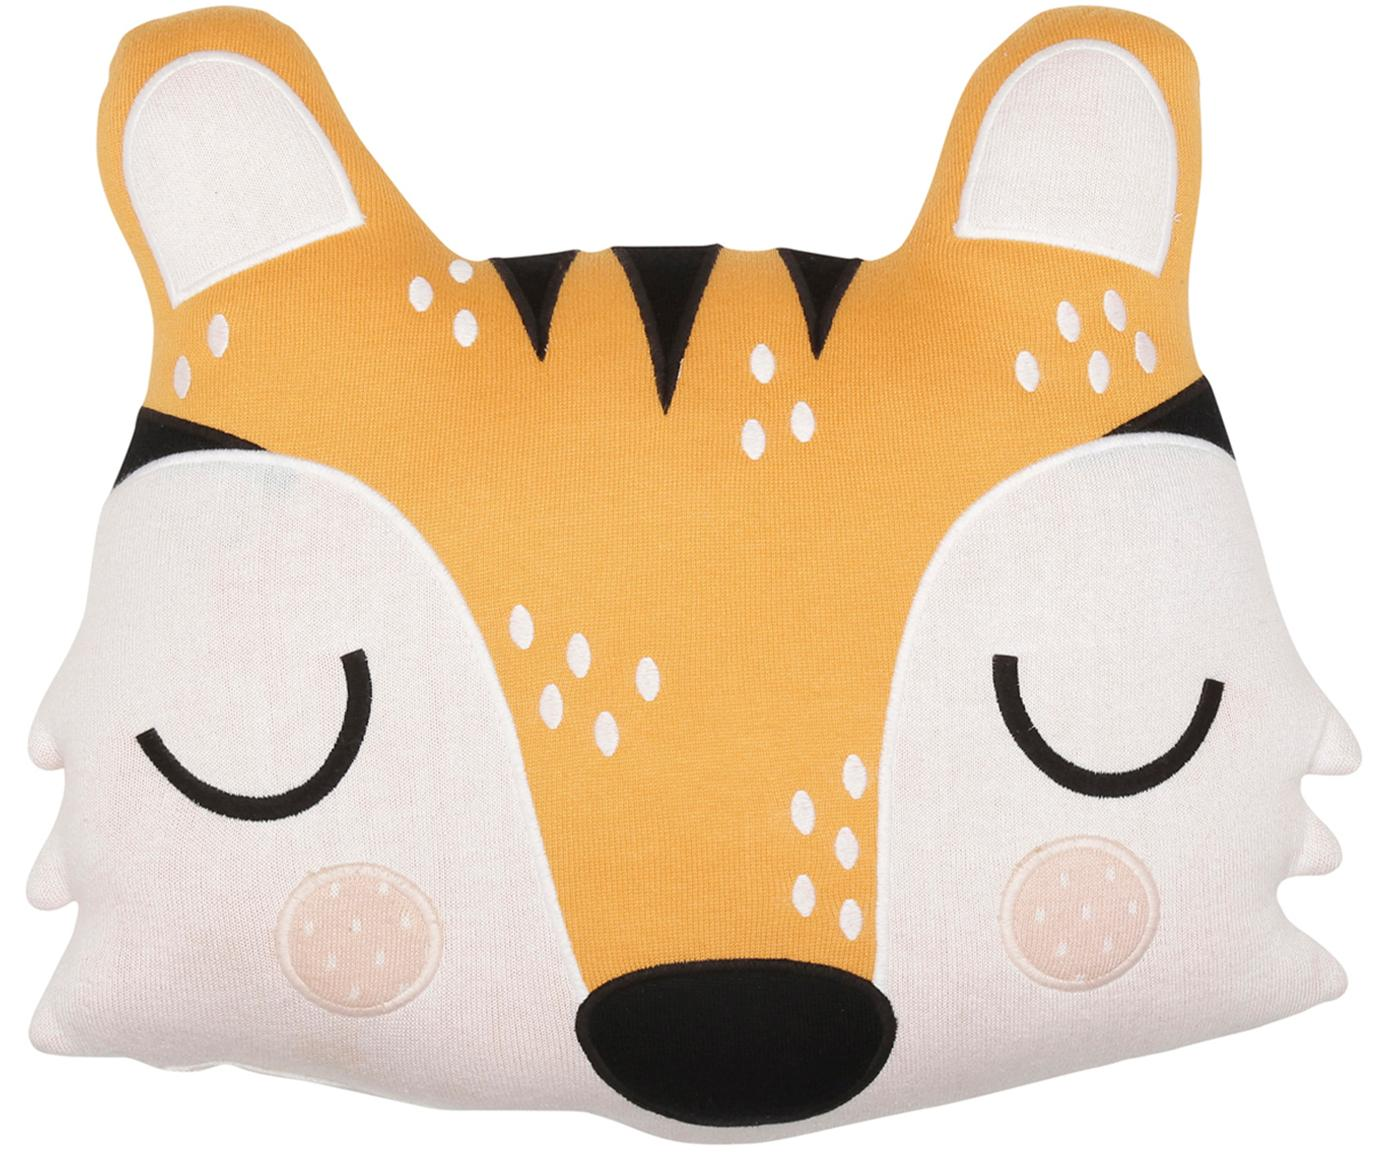 Cojín peluche de algodón ecológico Tiger Theo, Algodón ecológico, certificado GOTS, Naranja, crema, negro, An 40 x L 45 cm